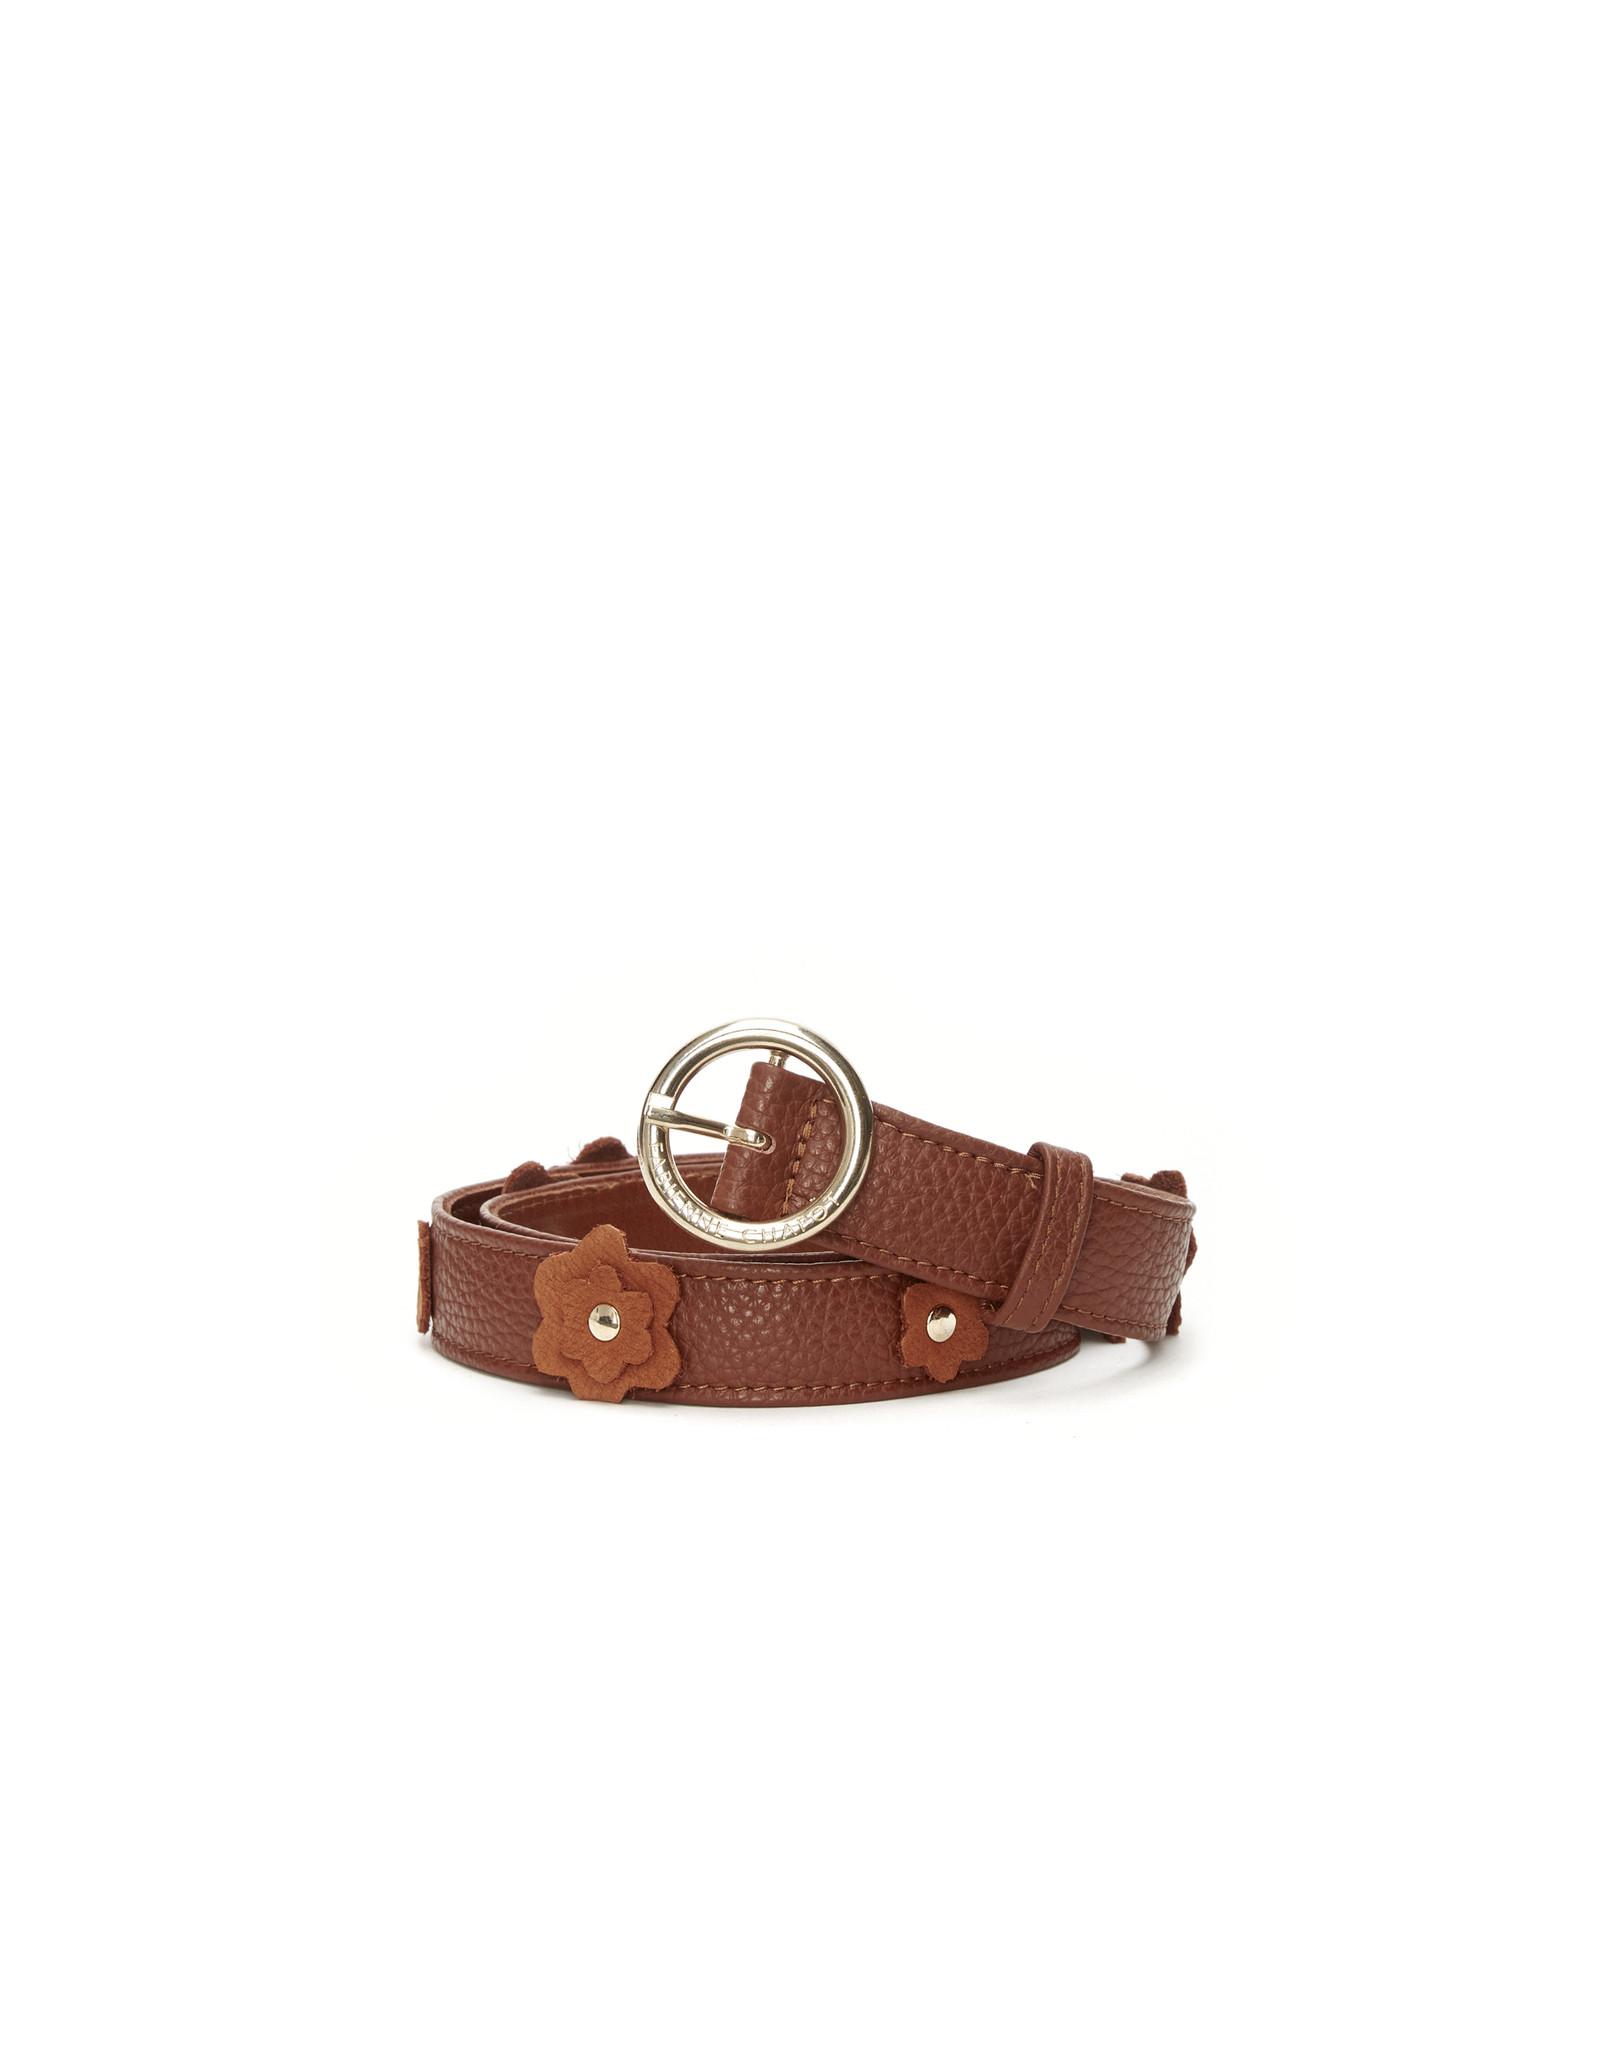 Fabienne Chapot Flower Belt Cognac